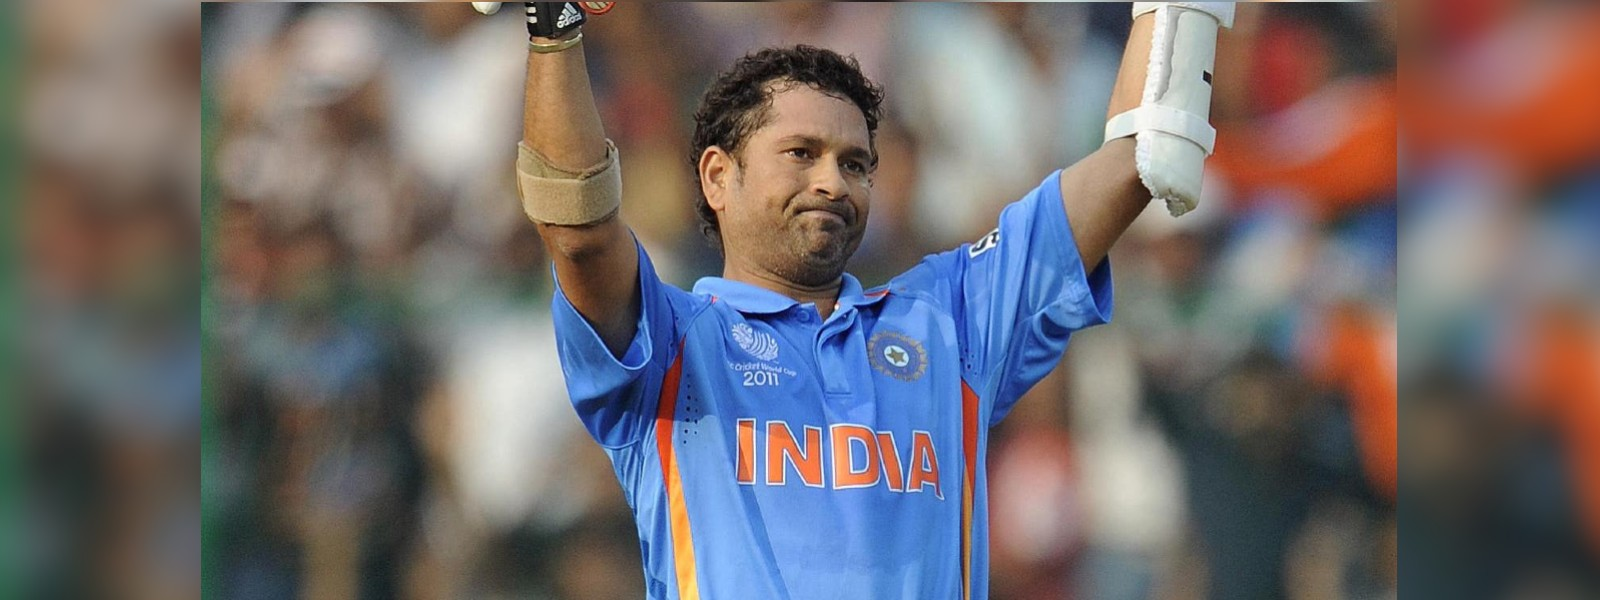 Indian Cricket Icon Sachin Tendulkar tests positive for COVID-19